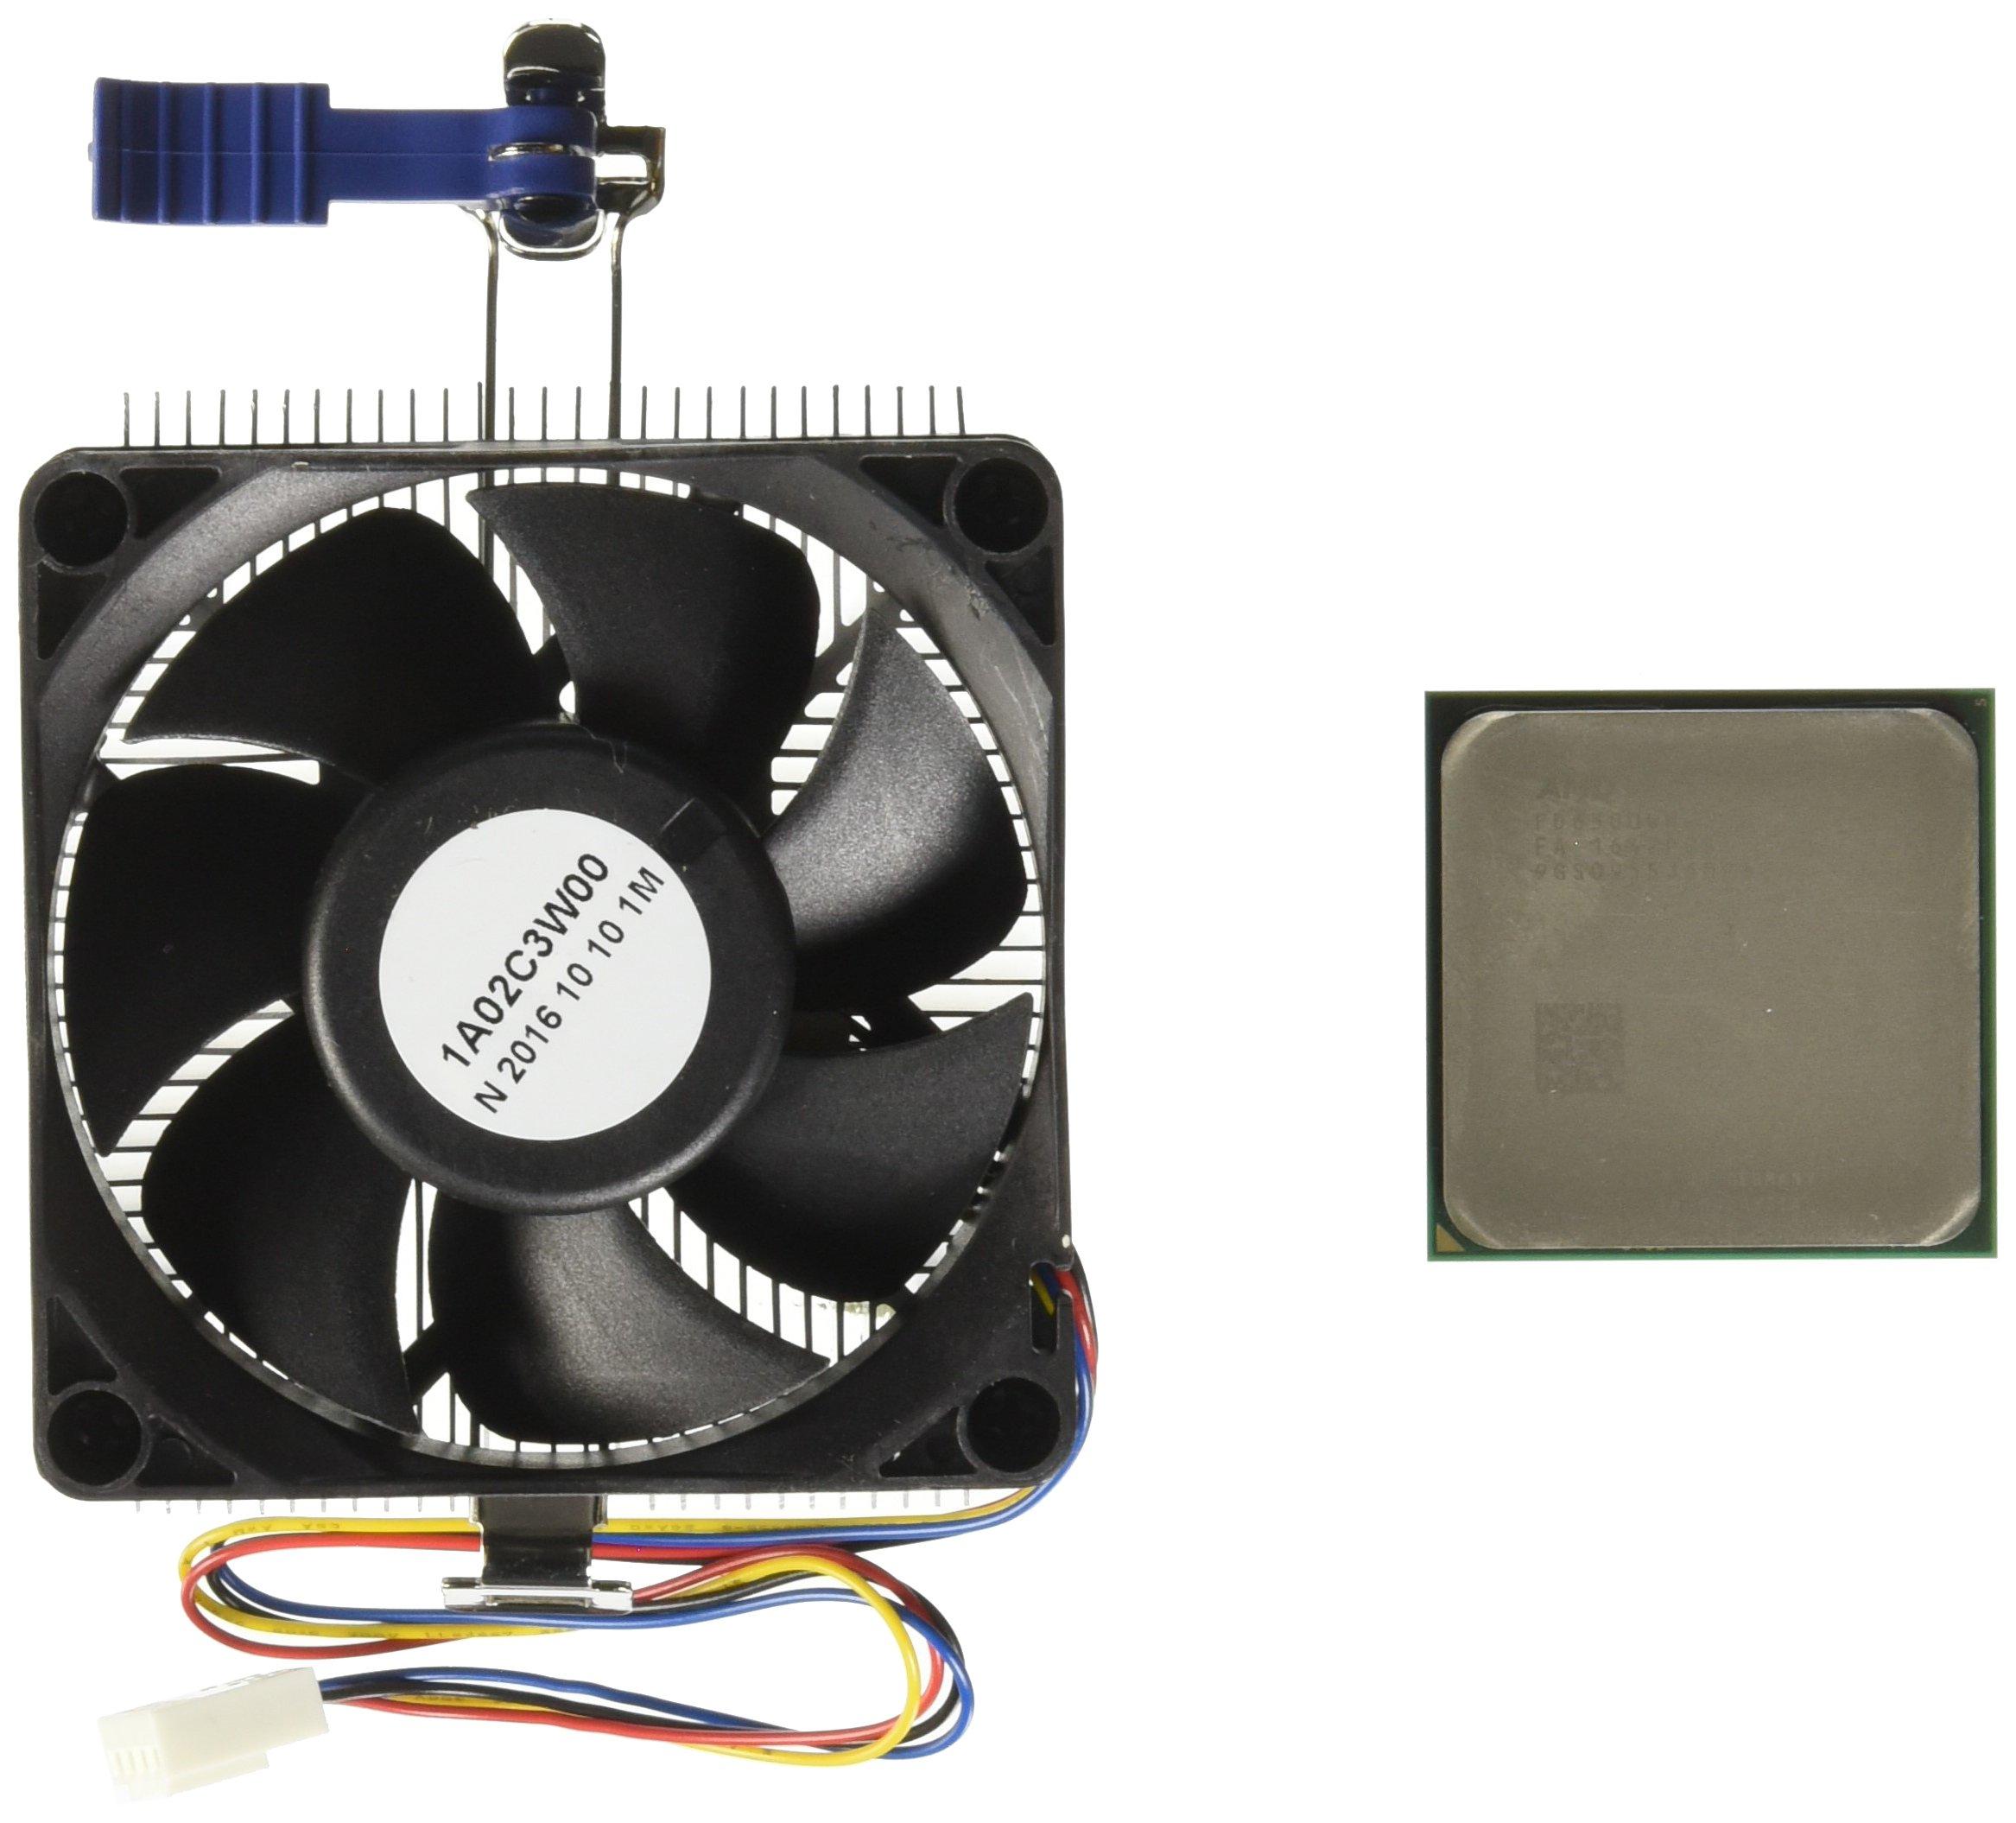 AMD-FD6300WMHKBOX-FX-6300-6-Core-Processor-Black-Edition